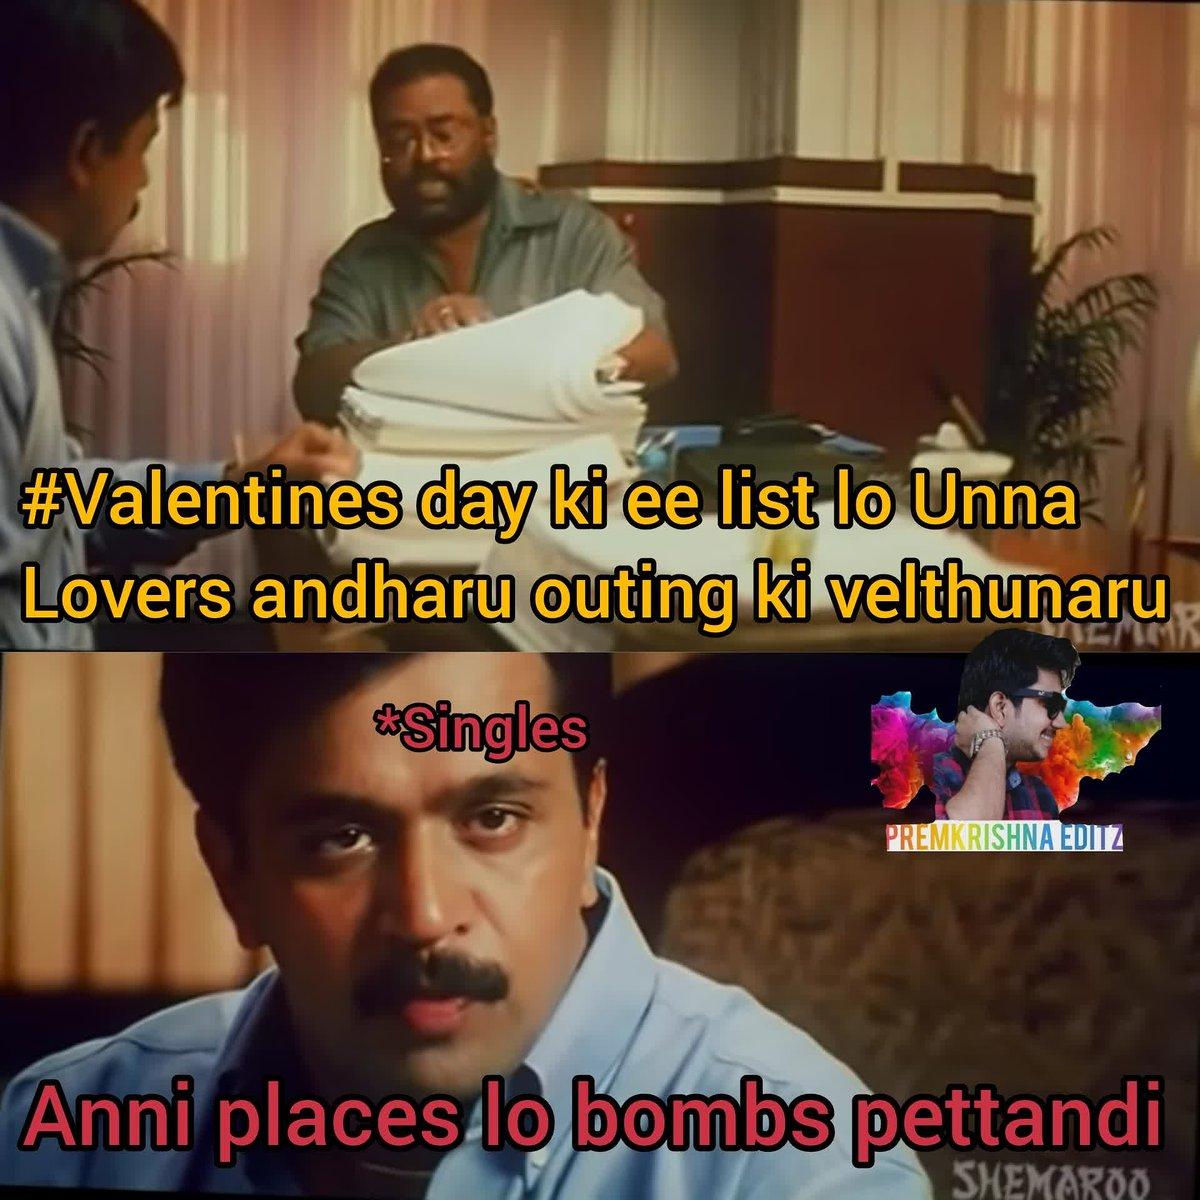 Like & follow for more fun#single #Crickettrolls #telugutrolls #tamiltrolls #tamilcomedy #telugucomedy #telugumemes #teluguedits #funnyedits #telugucomedy #trending #bestmemes #jabardasth #adhirindhi #trending #telugucomedy #telugumemespic.twitter.com/UUteq2i4Al